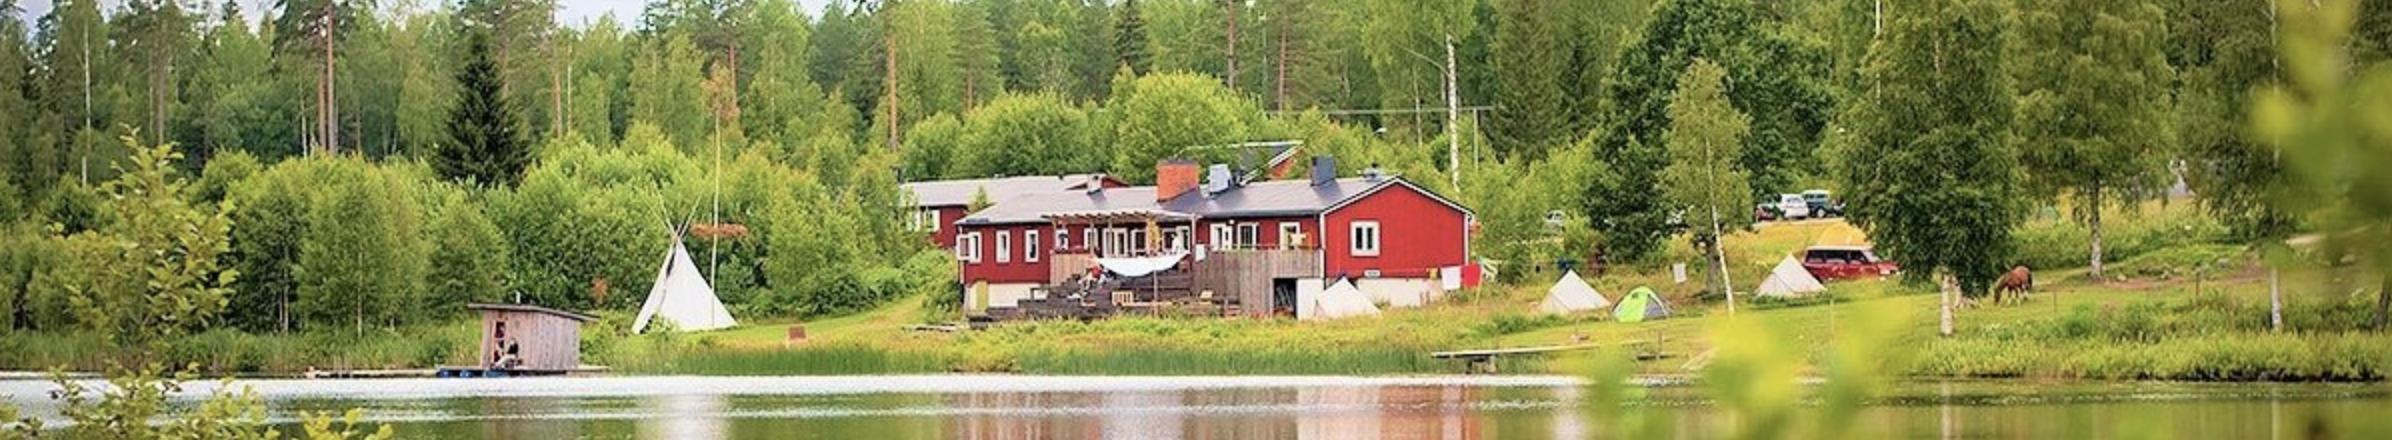 Shambala gatherings, Shambala, Shambala sweden, Shambala gatherings sweden, yoga center sweden, yoga retreat sweden, sweden yoga retreat, sweden yoga retreat center, yoga retreats sweden, yoga travel sweden